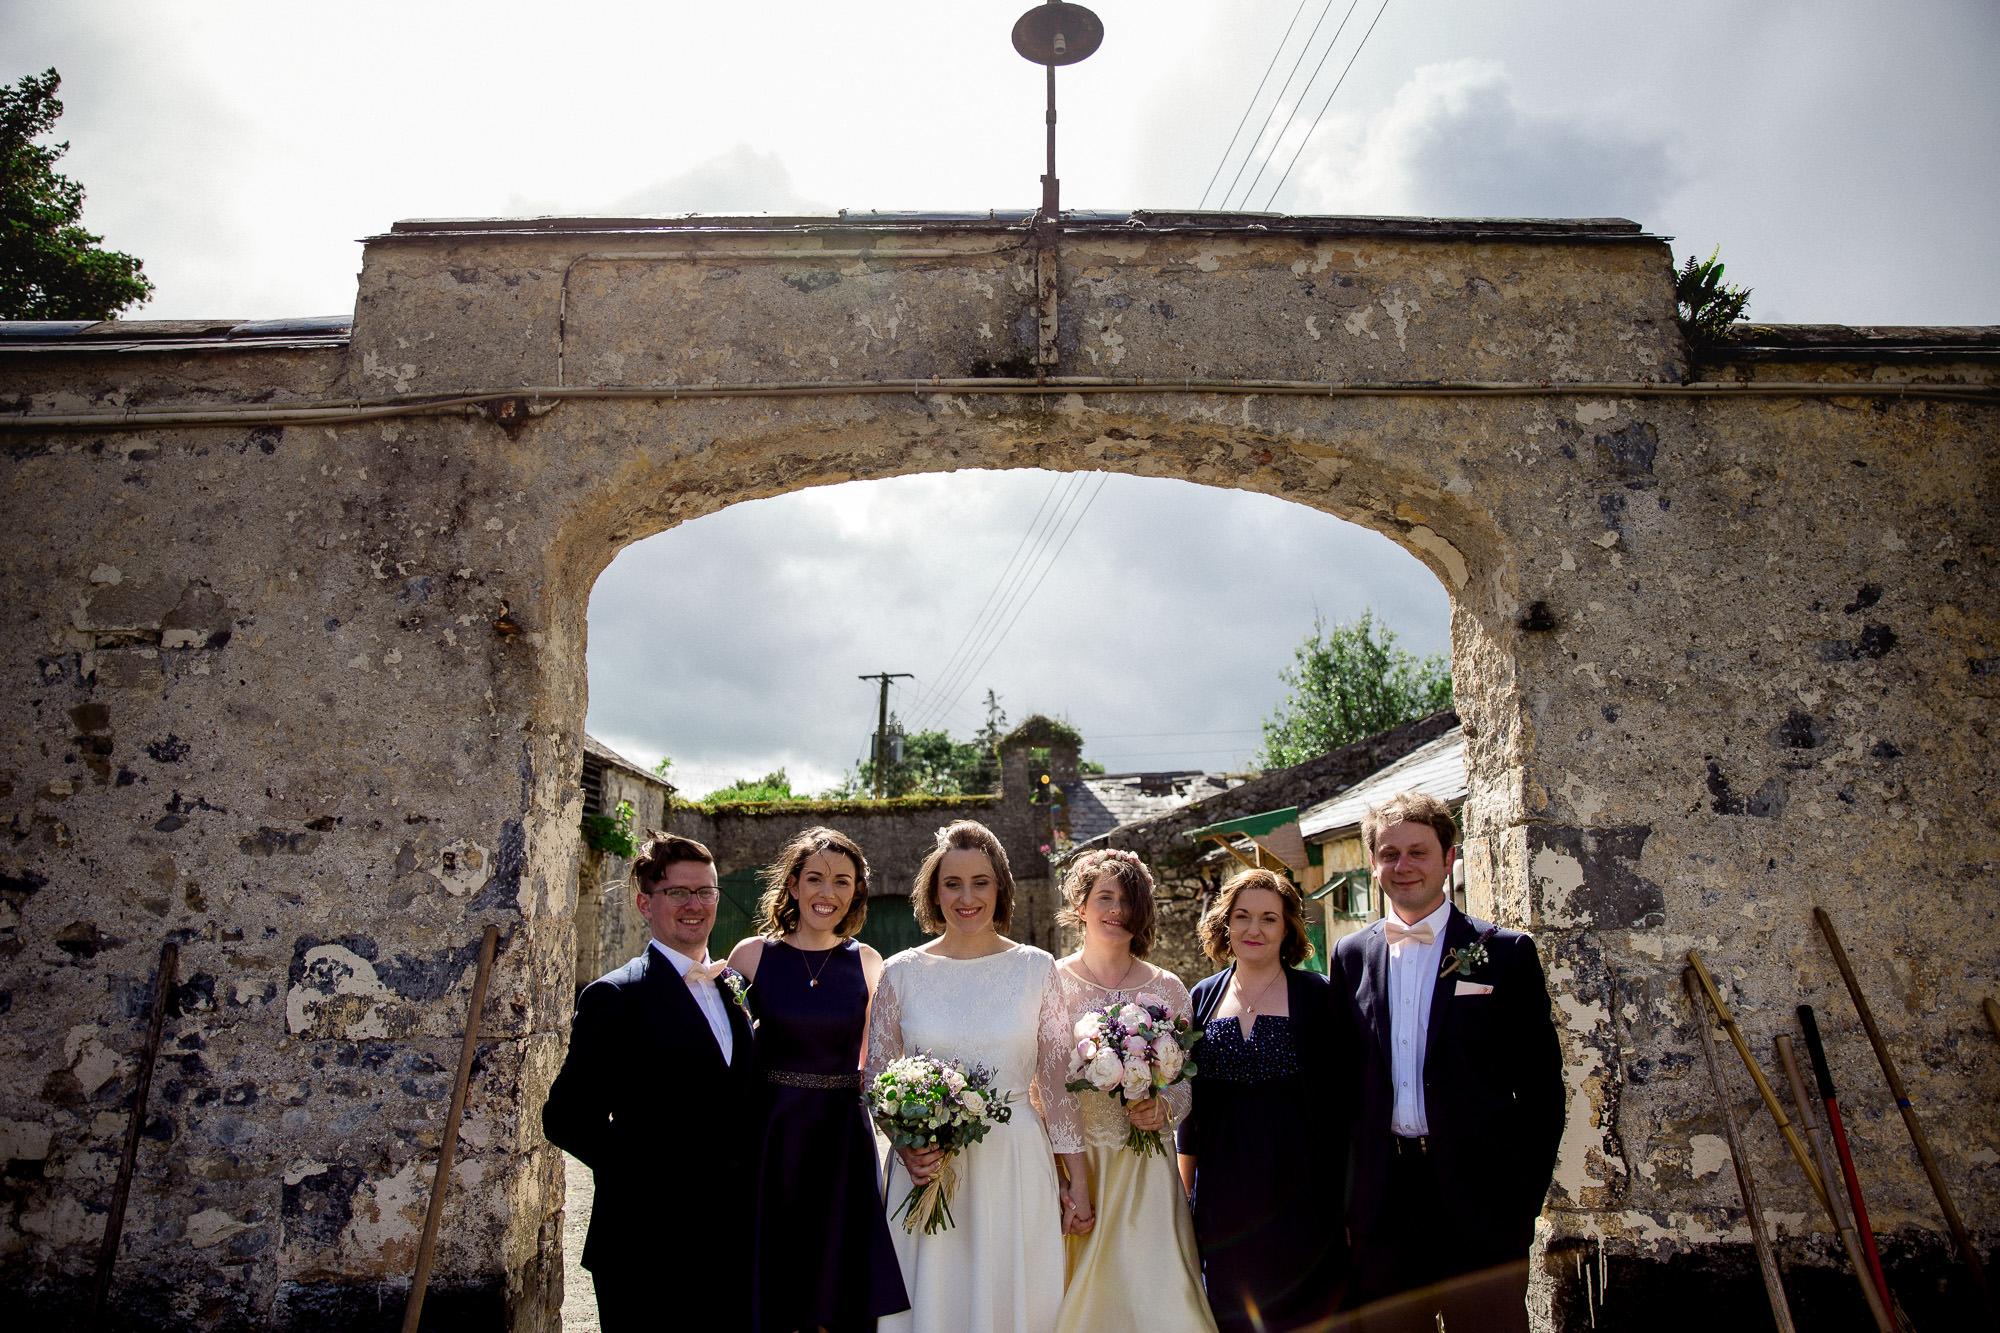 CLAIREBYRNEPHOTOGRAPHY-WEDDING-Ireland-cloncody-alternative-fun-Jen-Helena-12.jpg